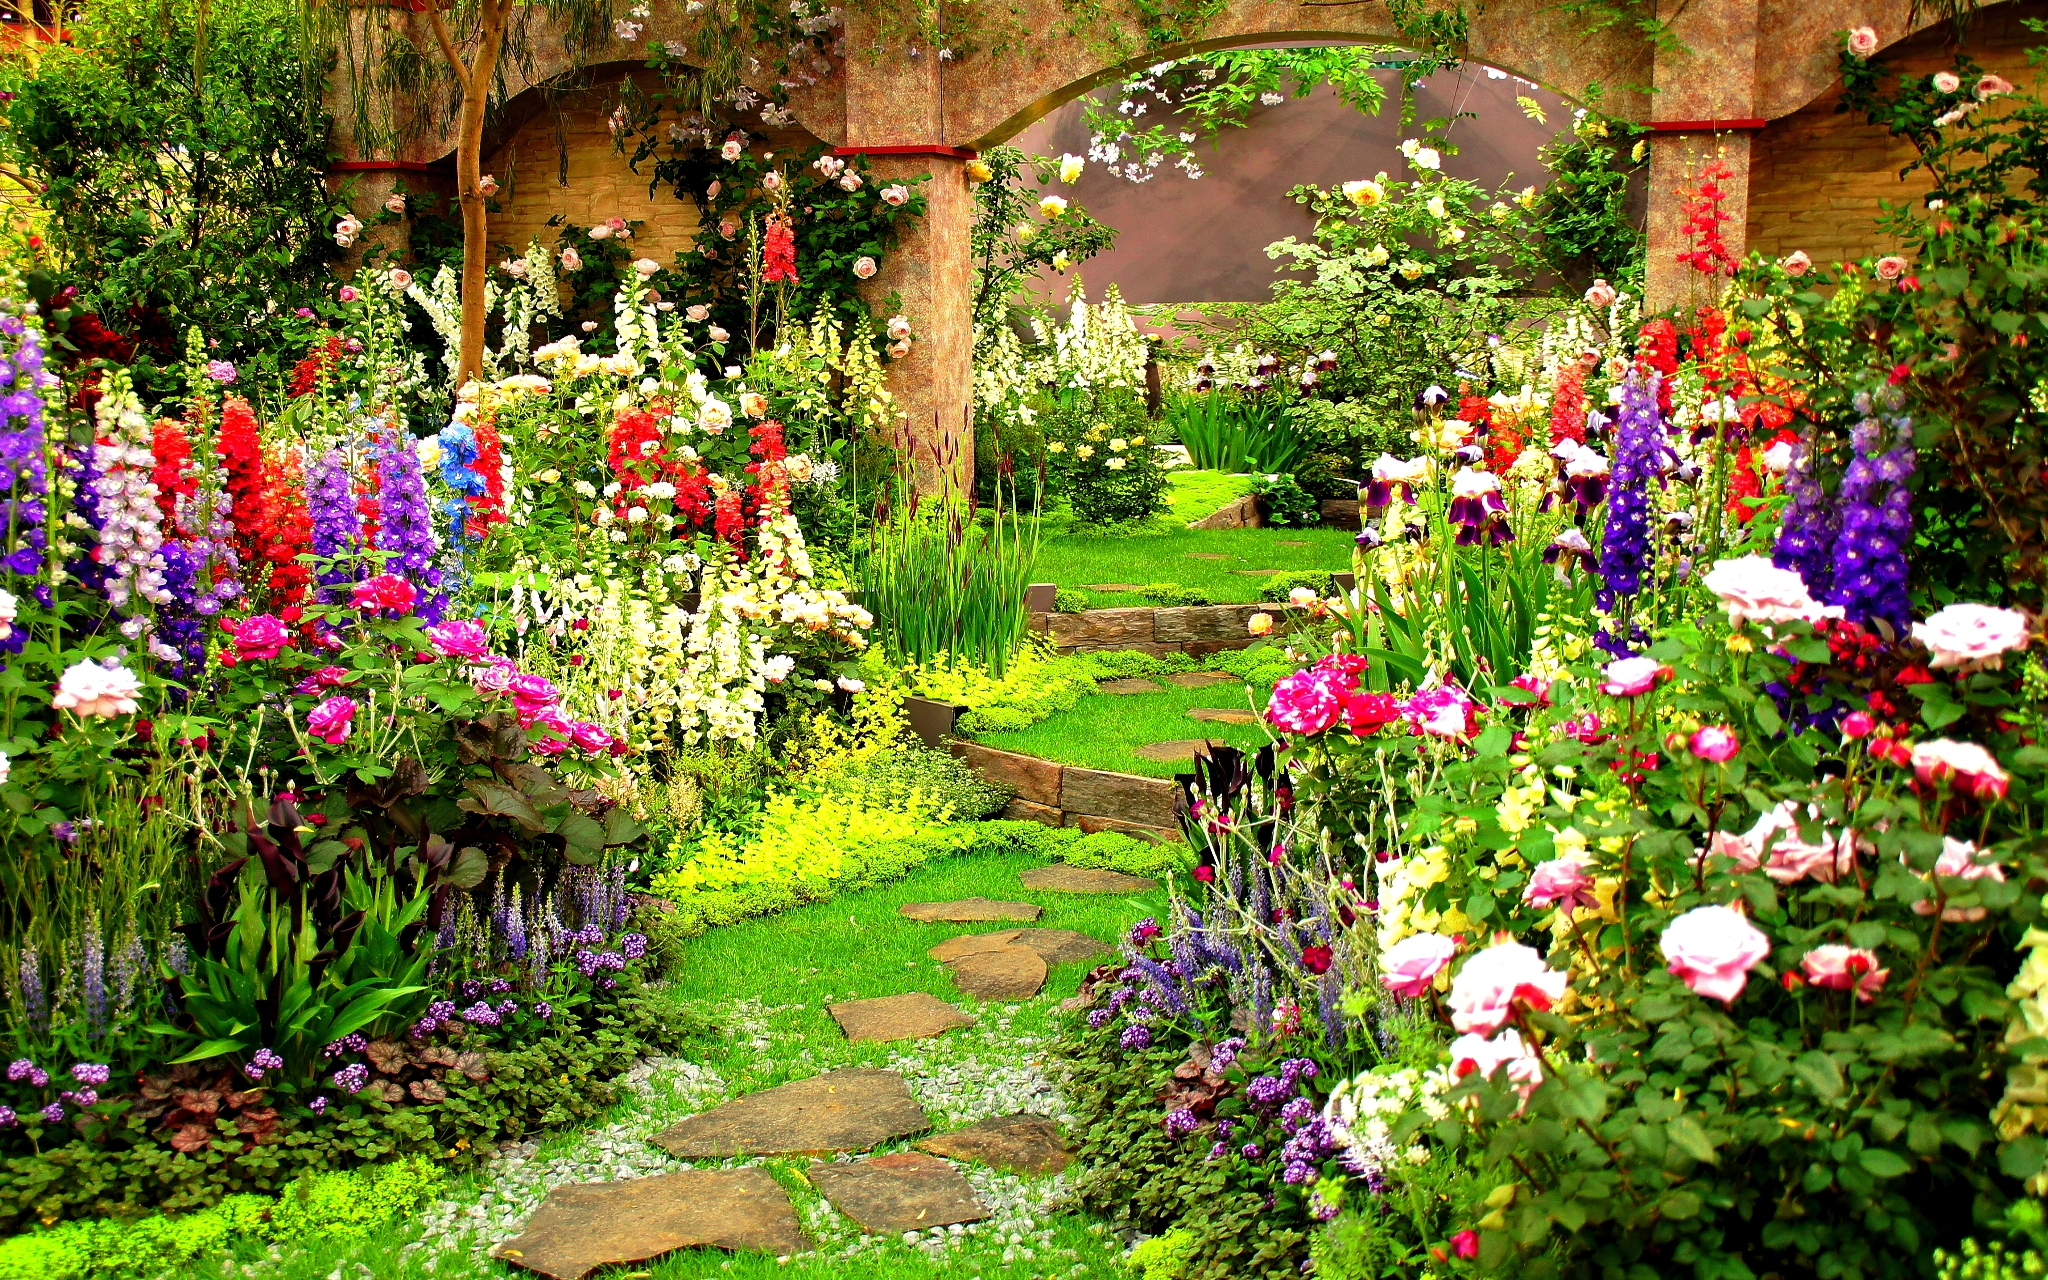 country garden wallpaper wallpapersafari. Black Bedroom Furniture Sets. Home Design Ideas